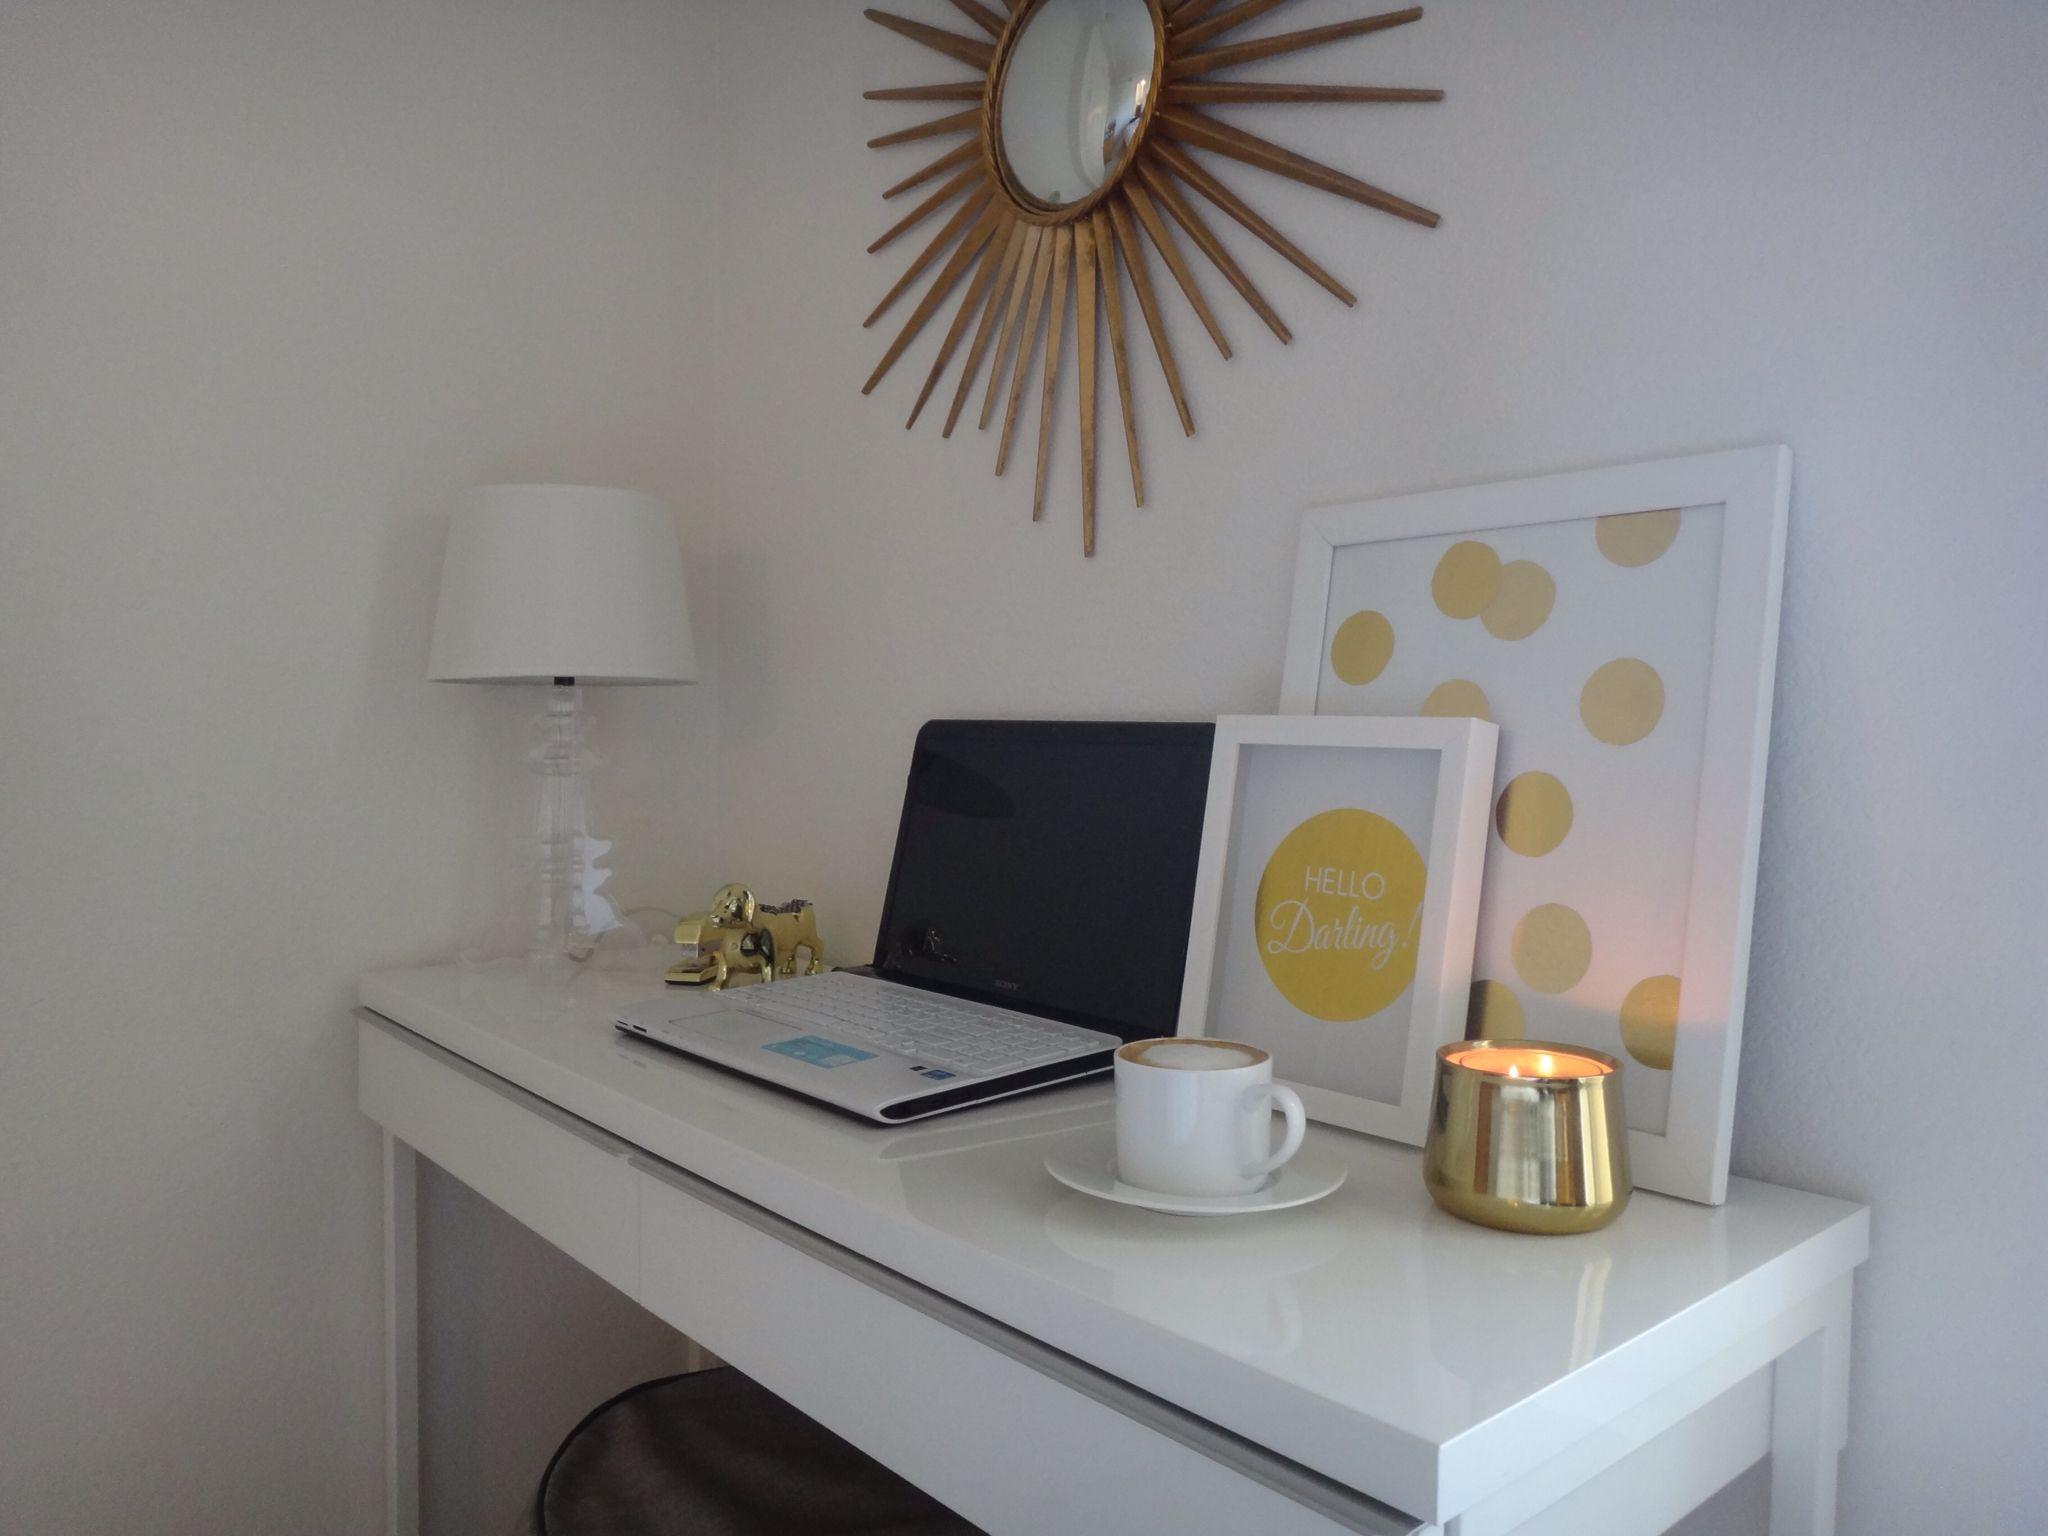 Desk Ikea Besta Burs The Mccarthy Suite Pinterest Desks  # Meuble Tv Ikea Besta Burs Noir